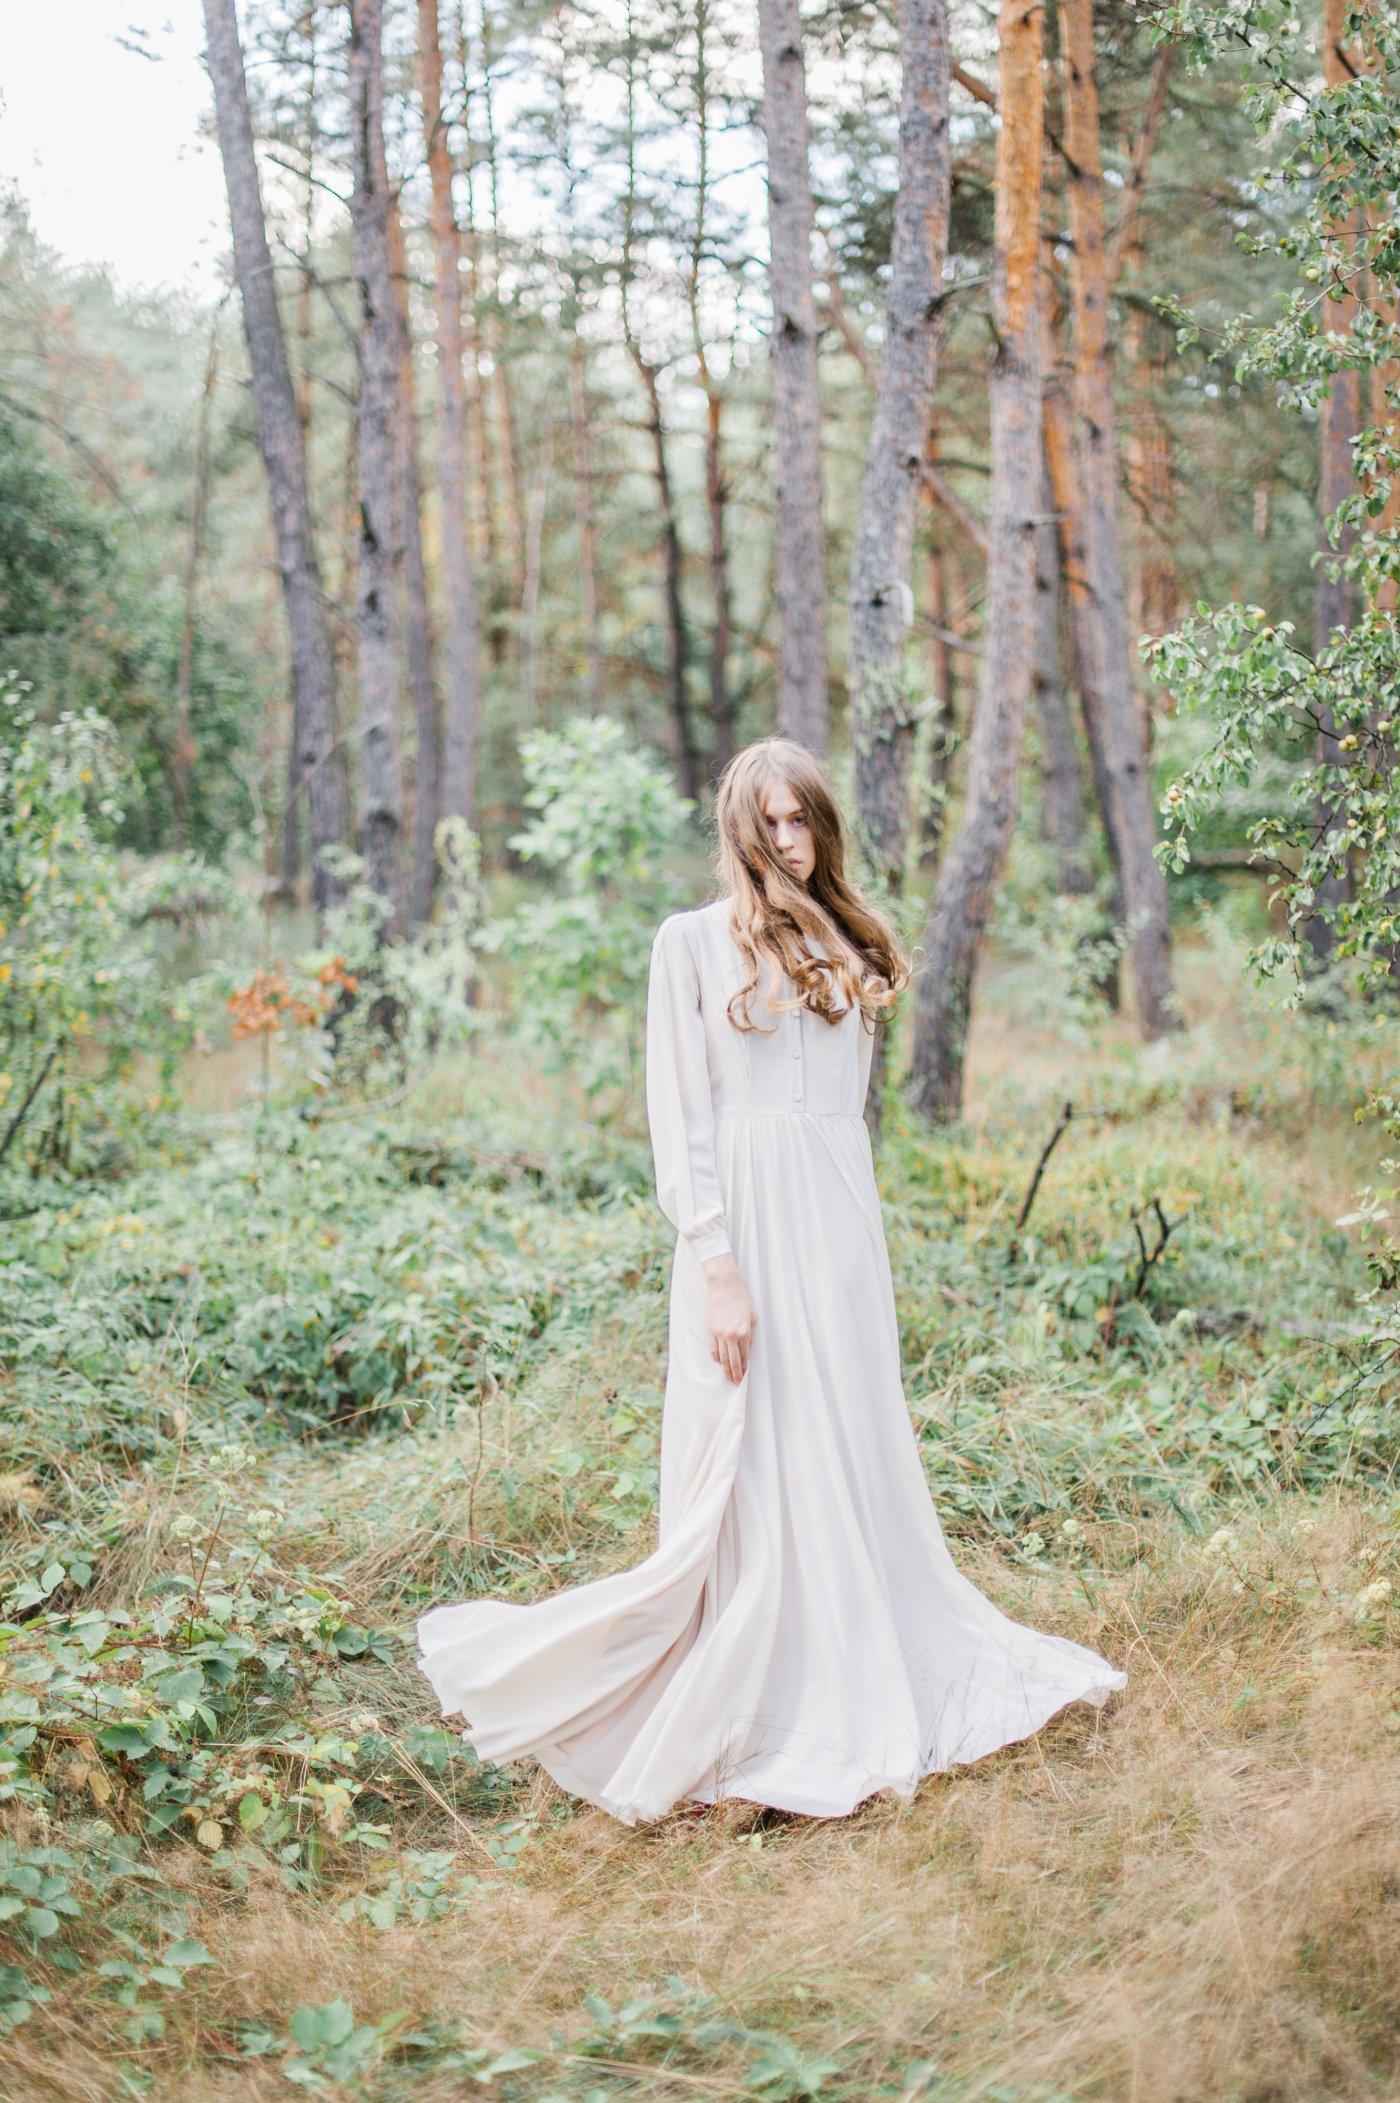 Morey Olive Wedding Dress With Shirtwaist Bodice